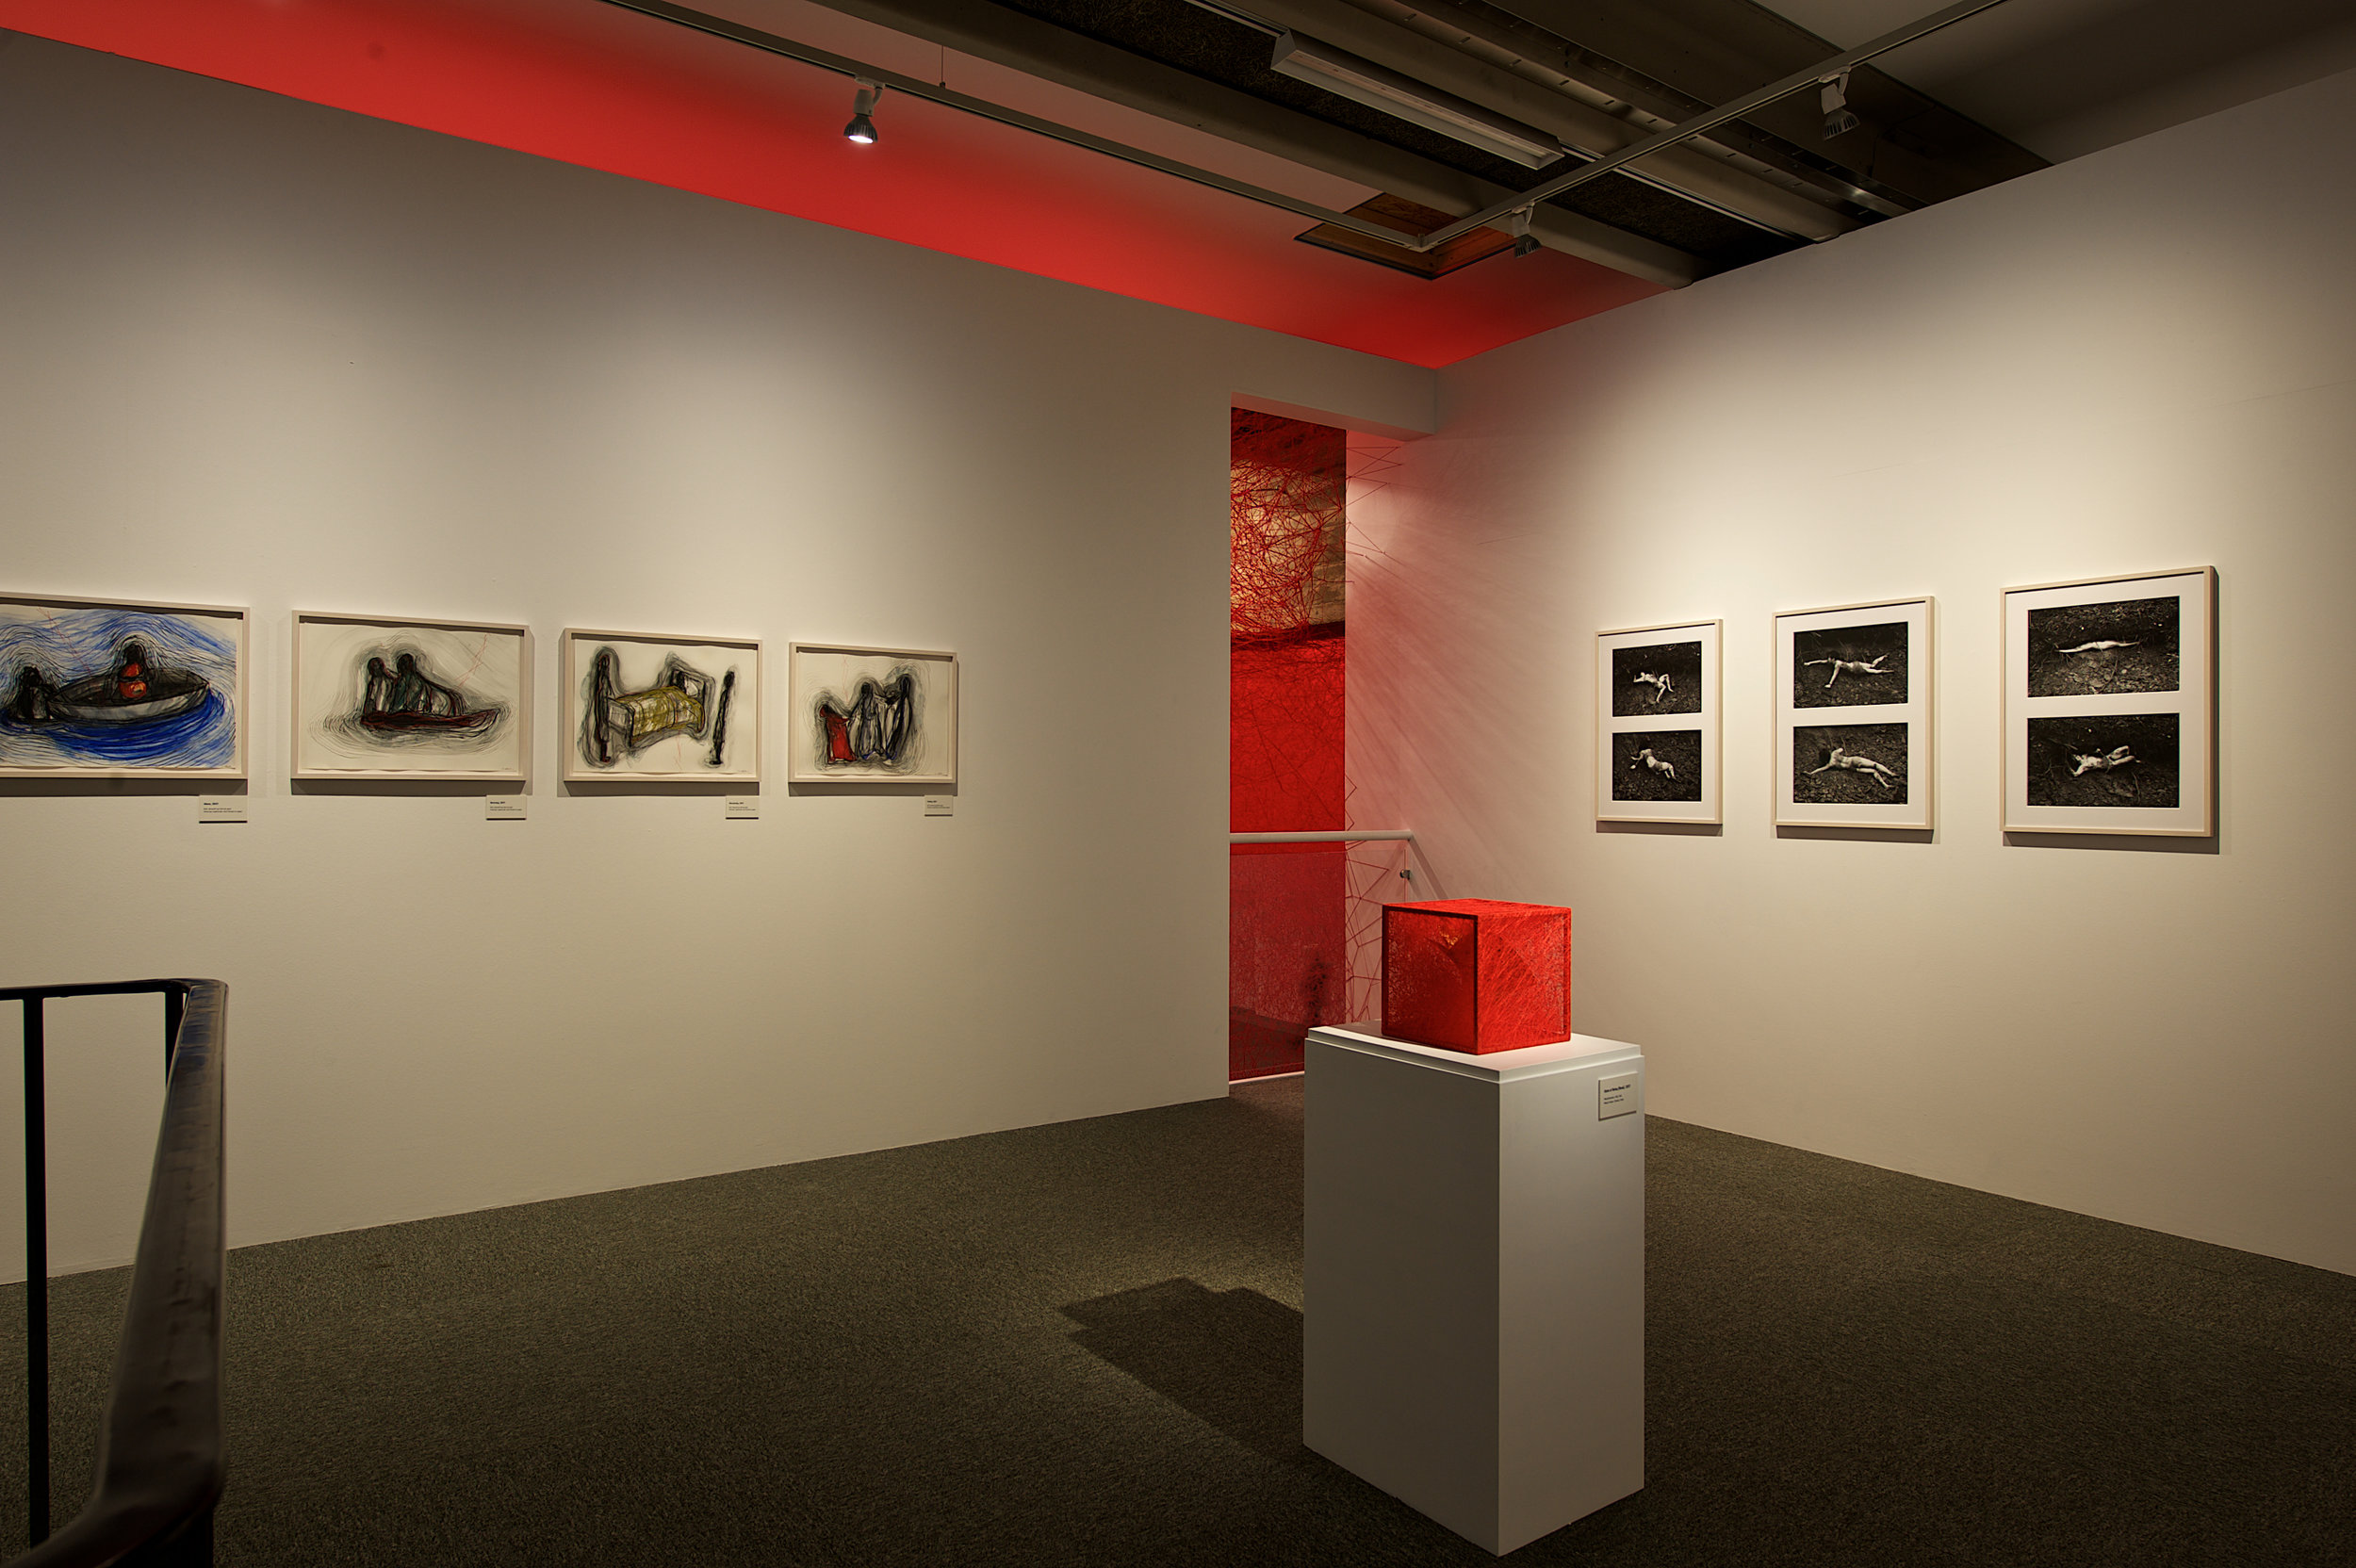 2017_Direction_KODE-ART Museum_Bergen,Norway_Photo Sunhi Mang_1.jpg